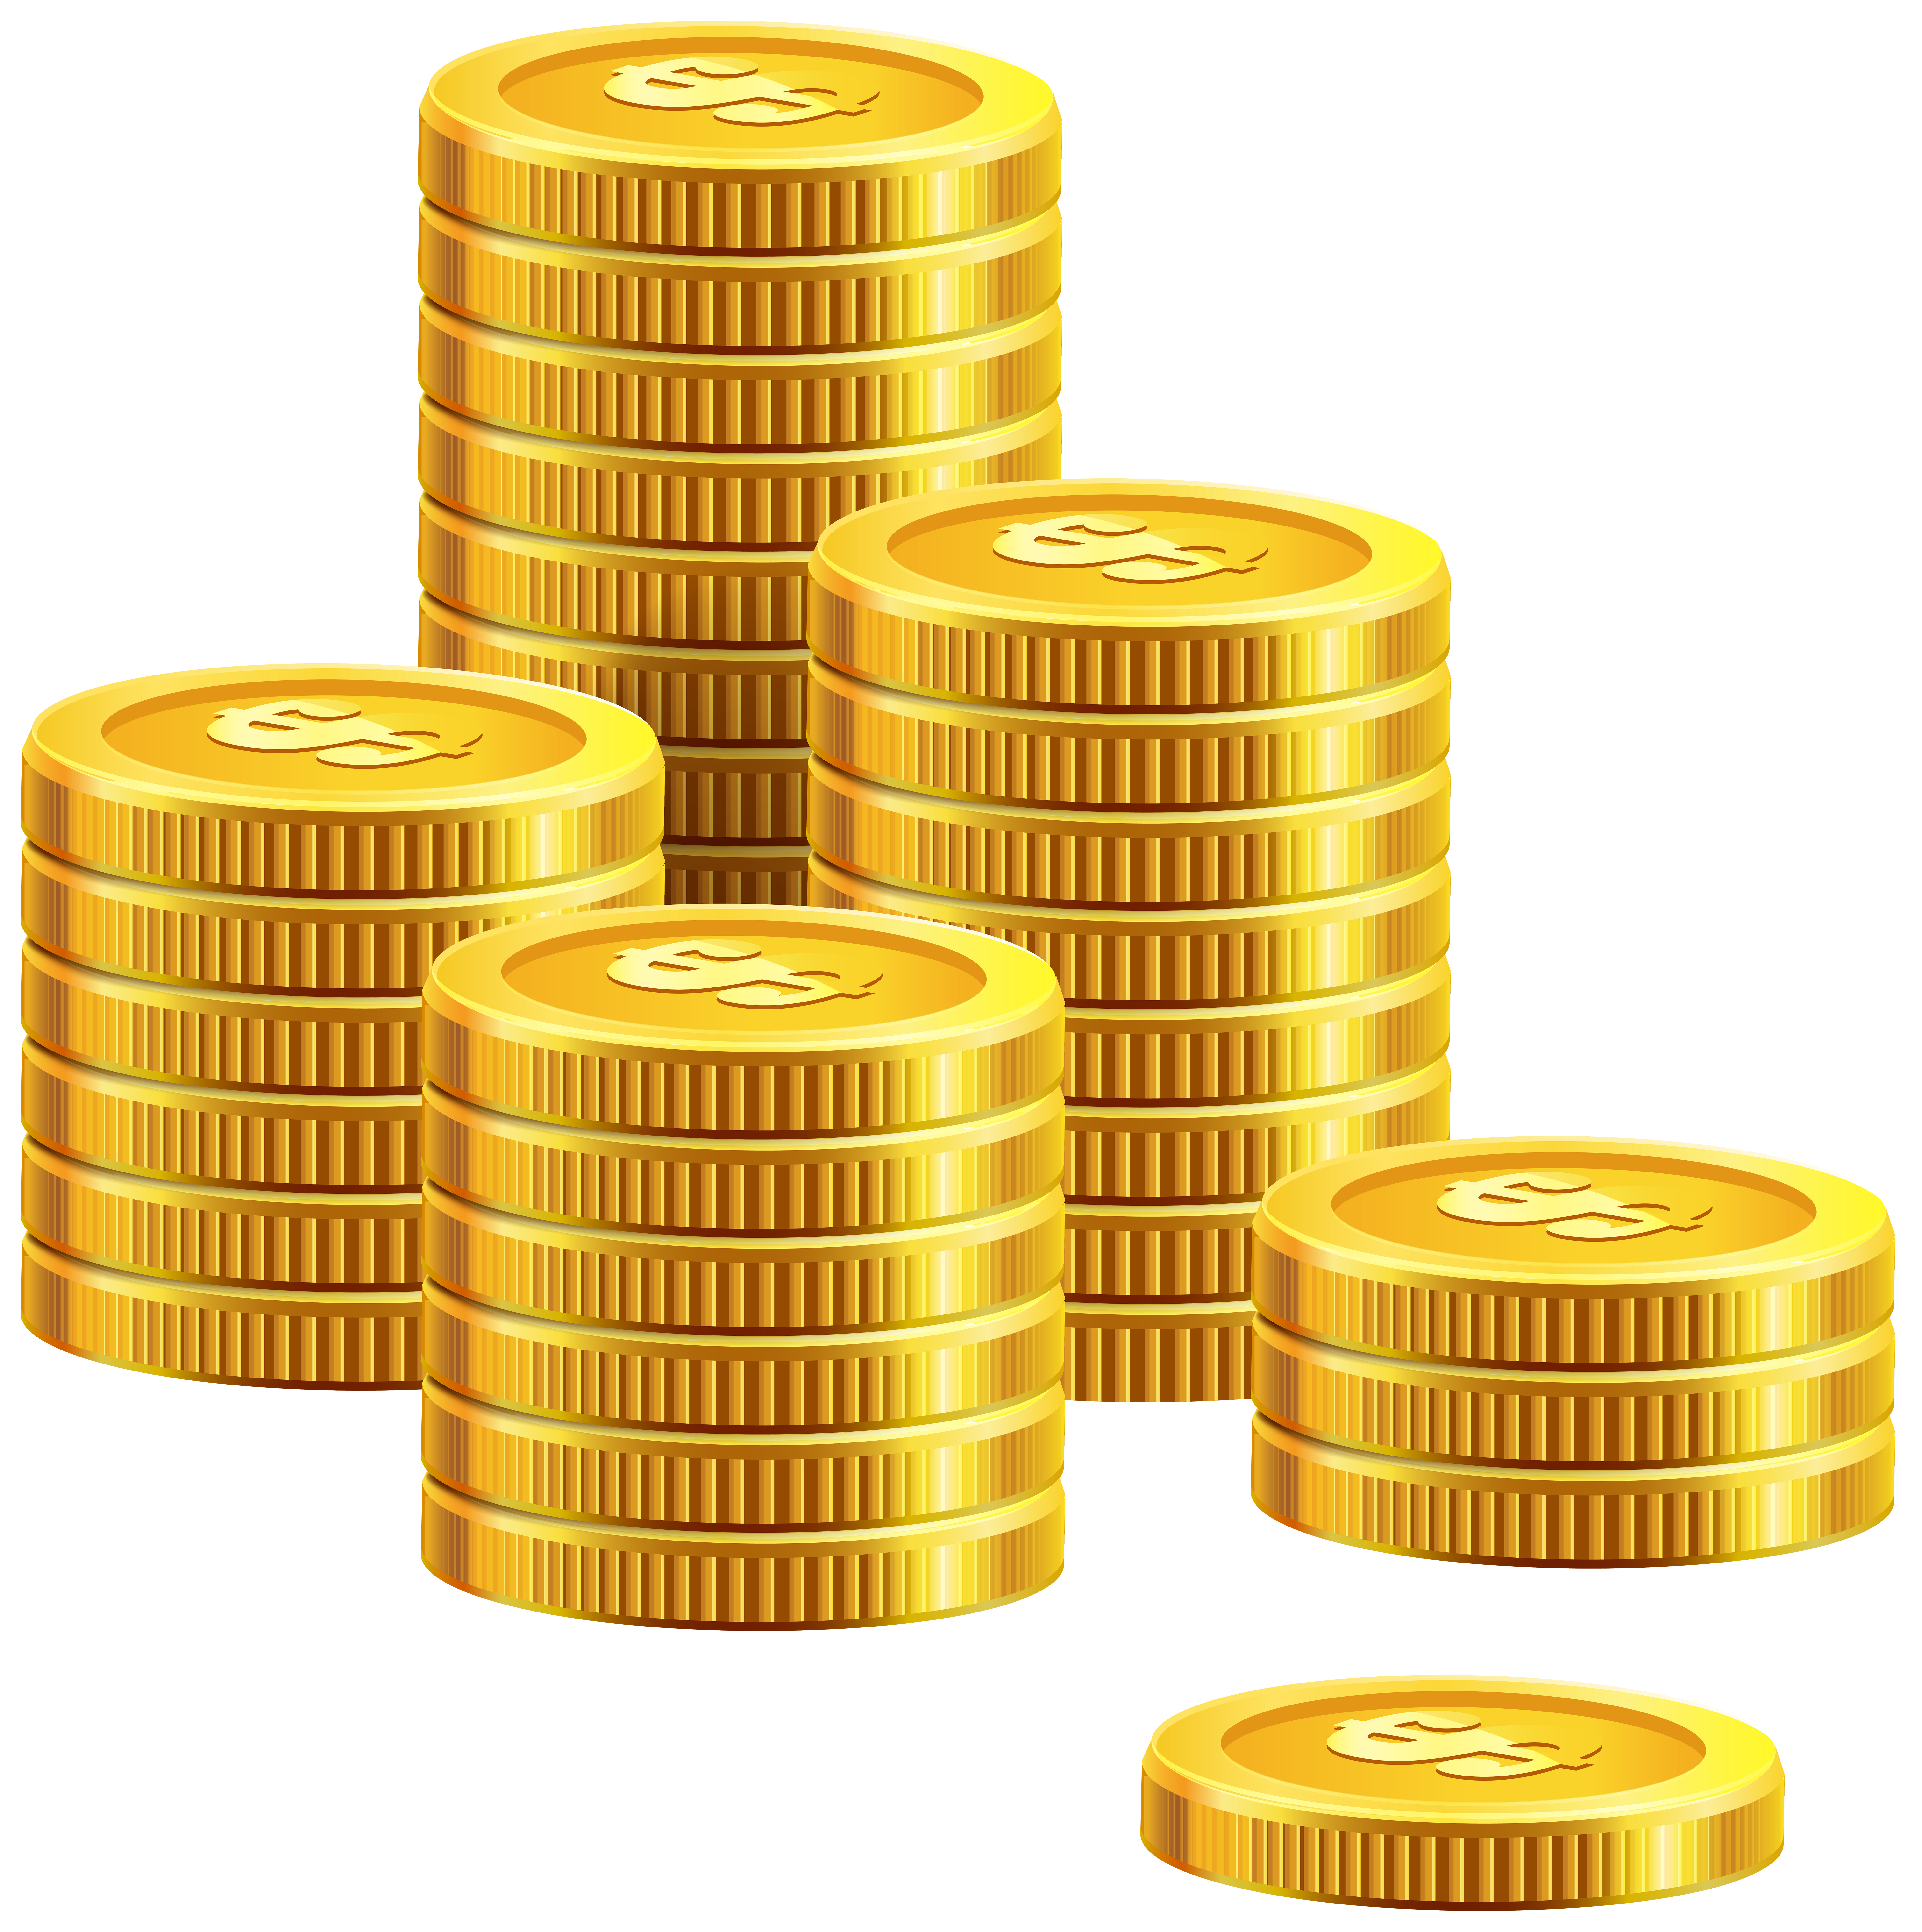 Coins clip art best. Pile of money png